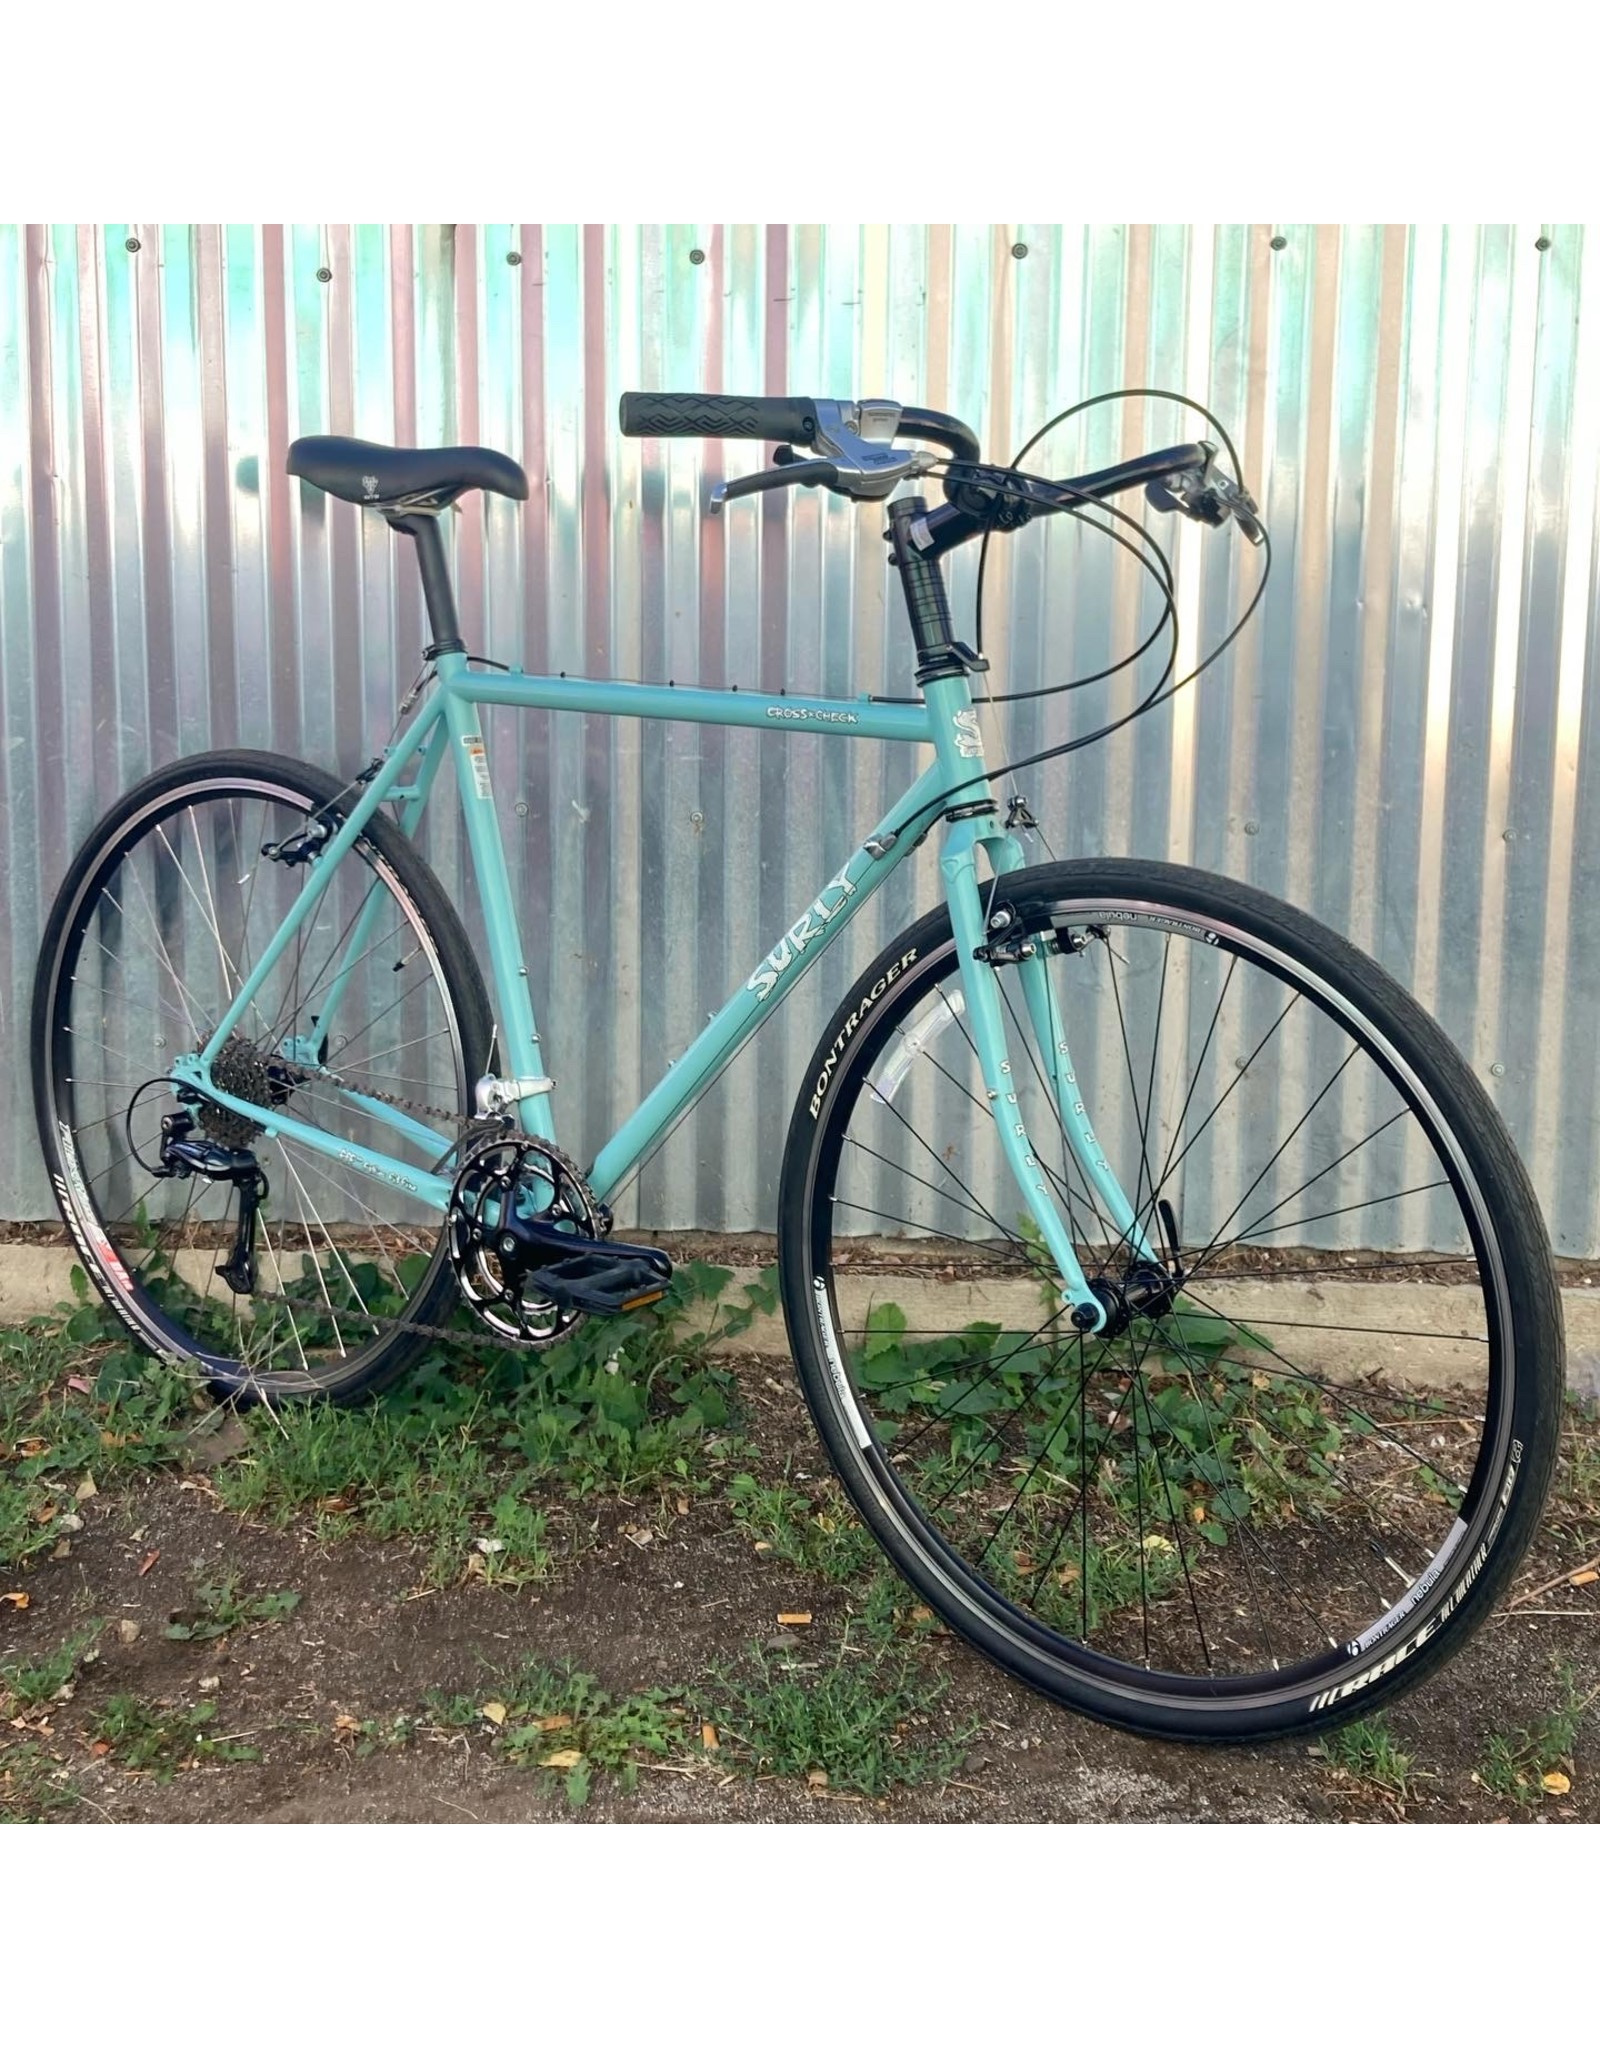 Used Bike 635 54cm Surly Cross Check